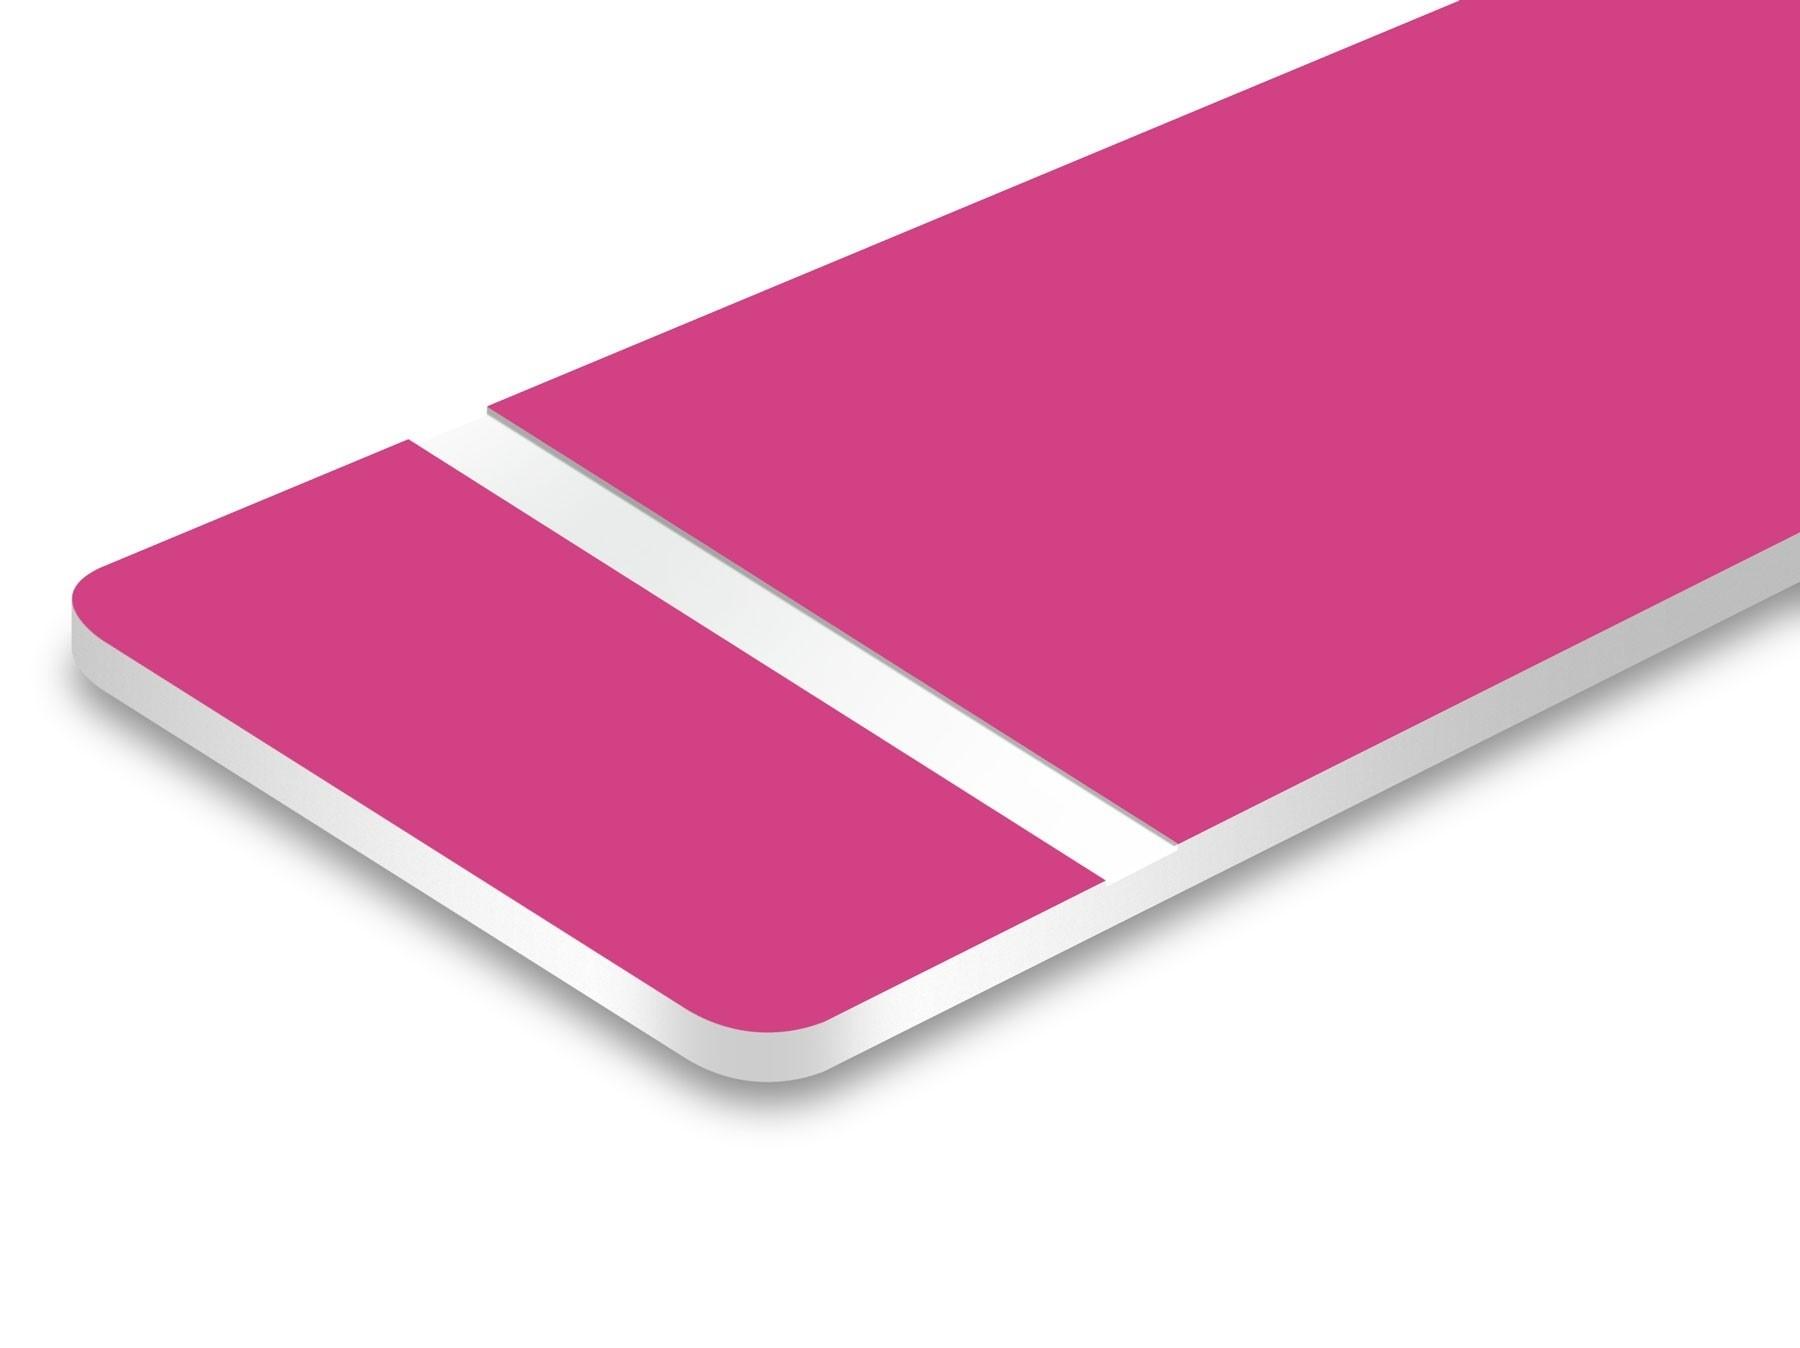 TroLase, Pink/White, 2ply, 1.6 mm